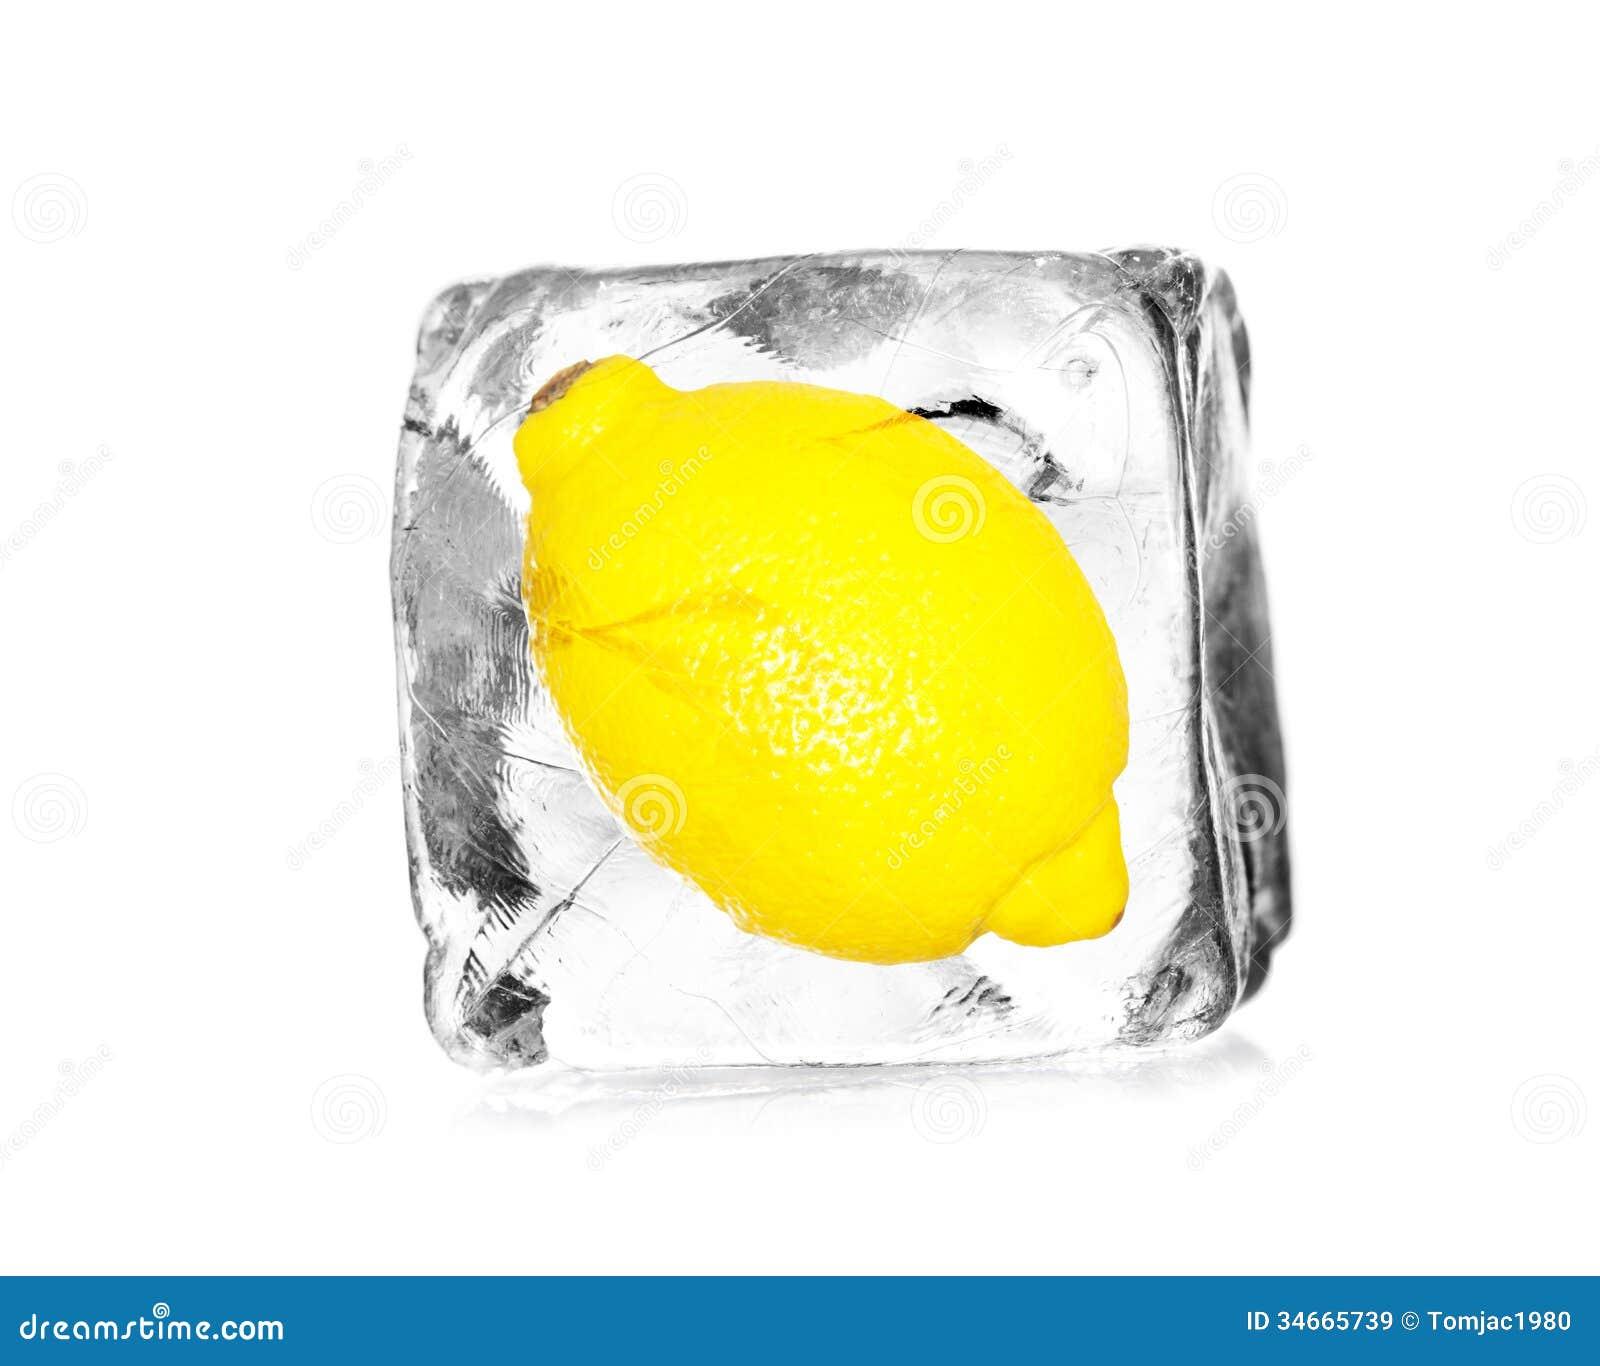 Ice cube melting on my big tits - 3 part 8